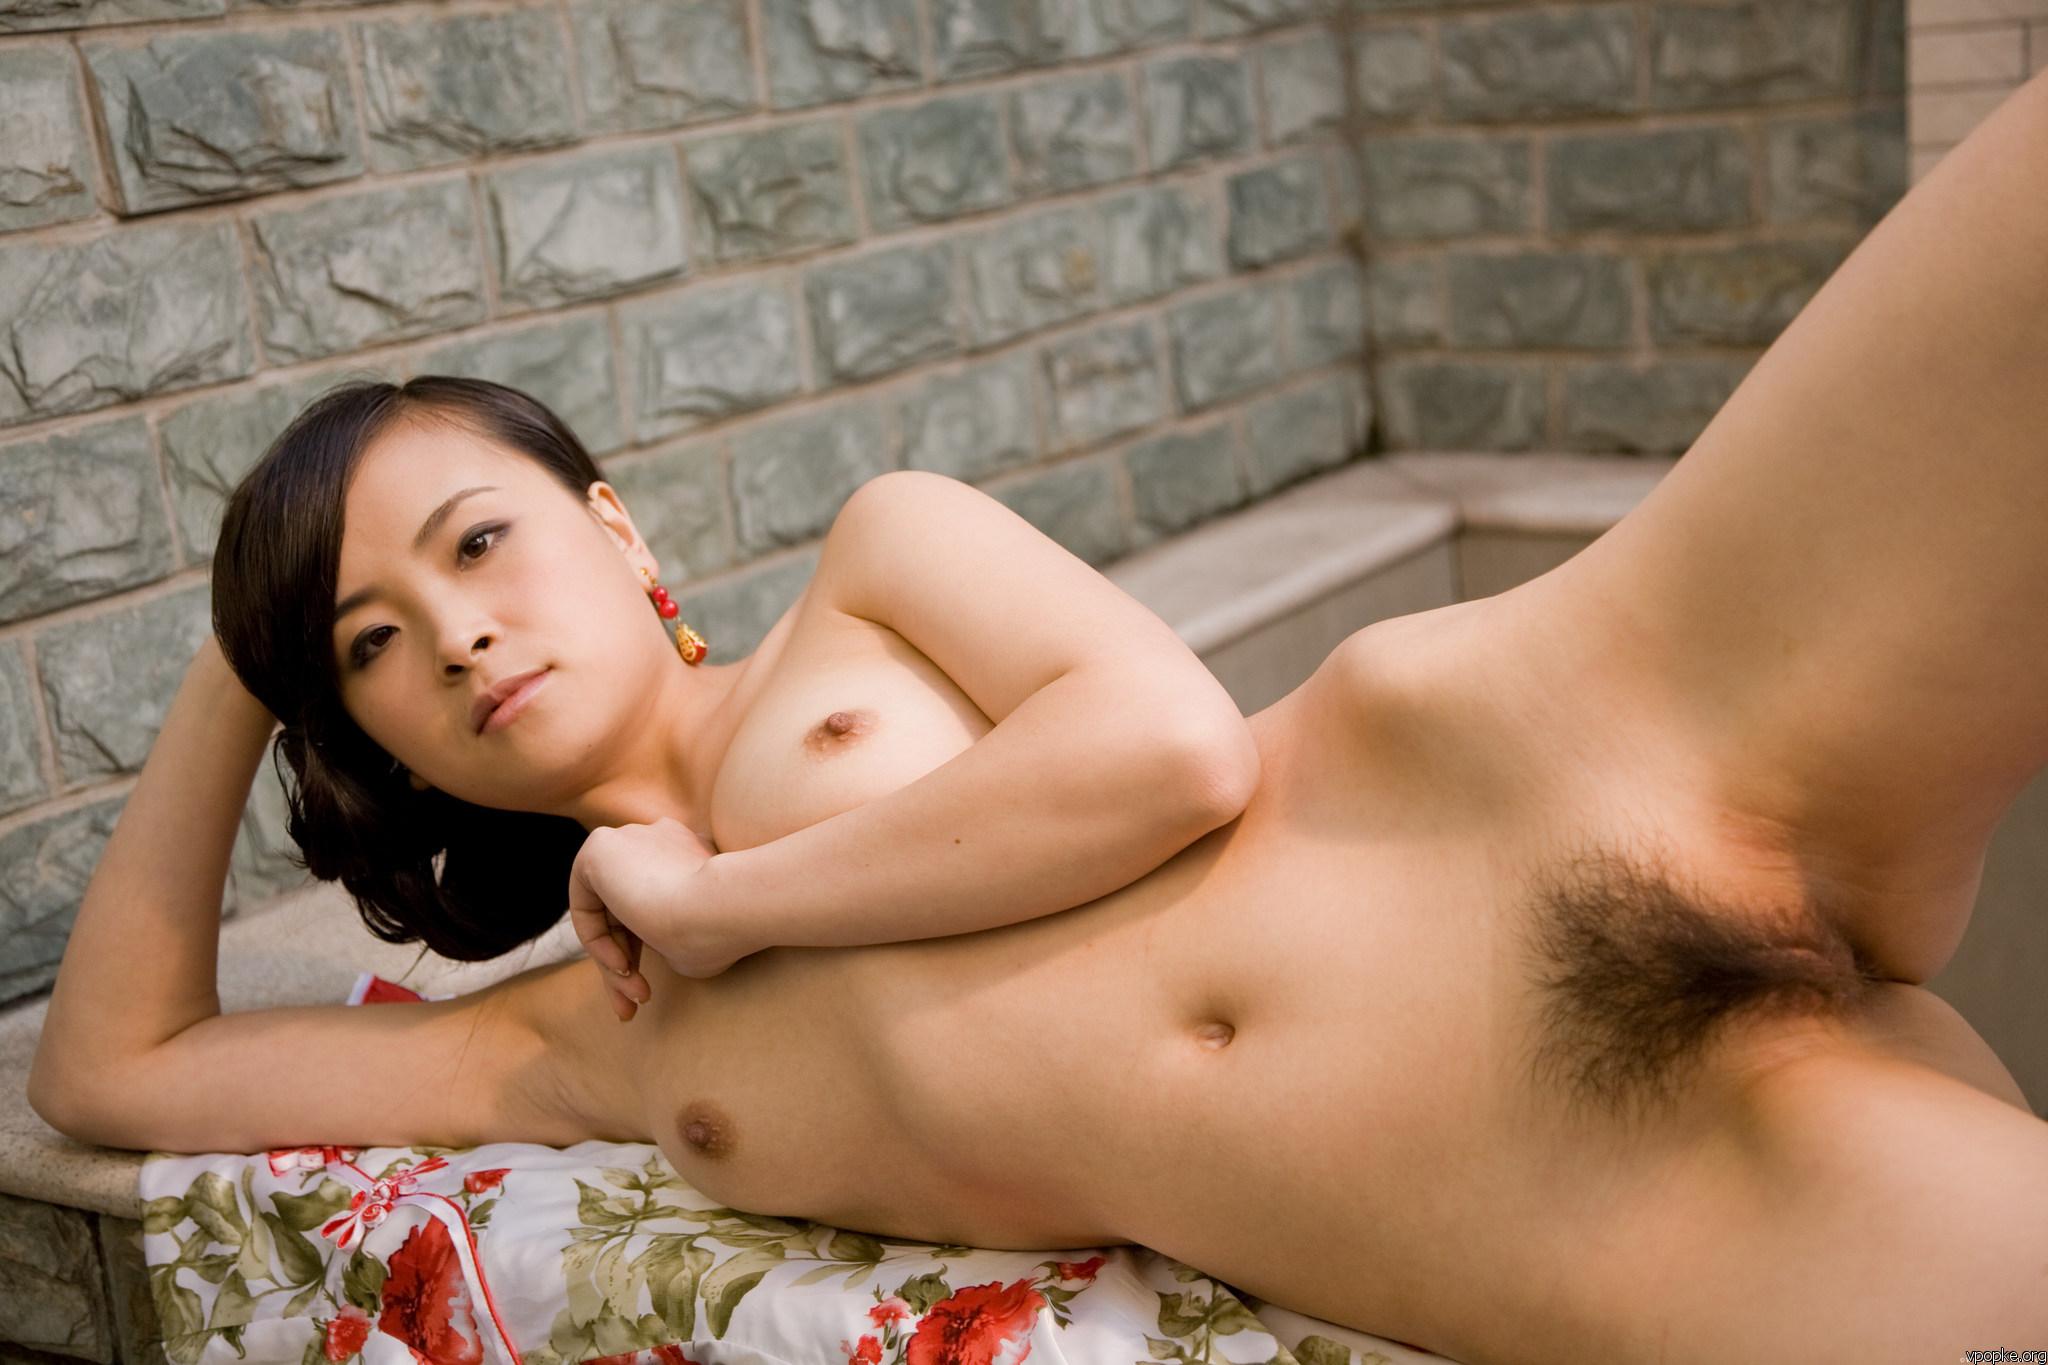 Эро фото молодых китоянок 4 фотография